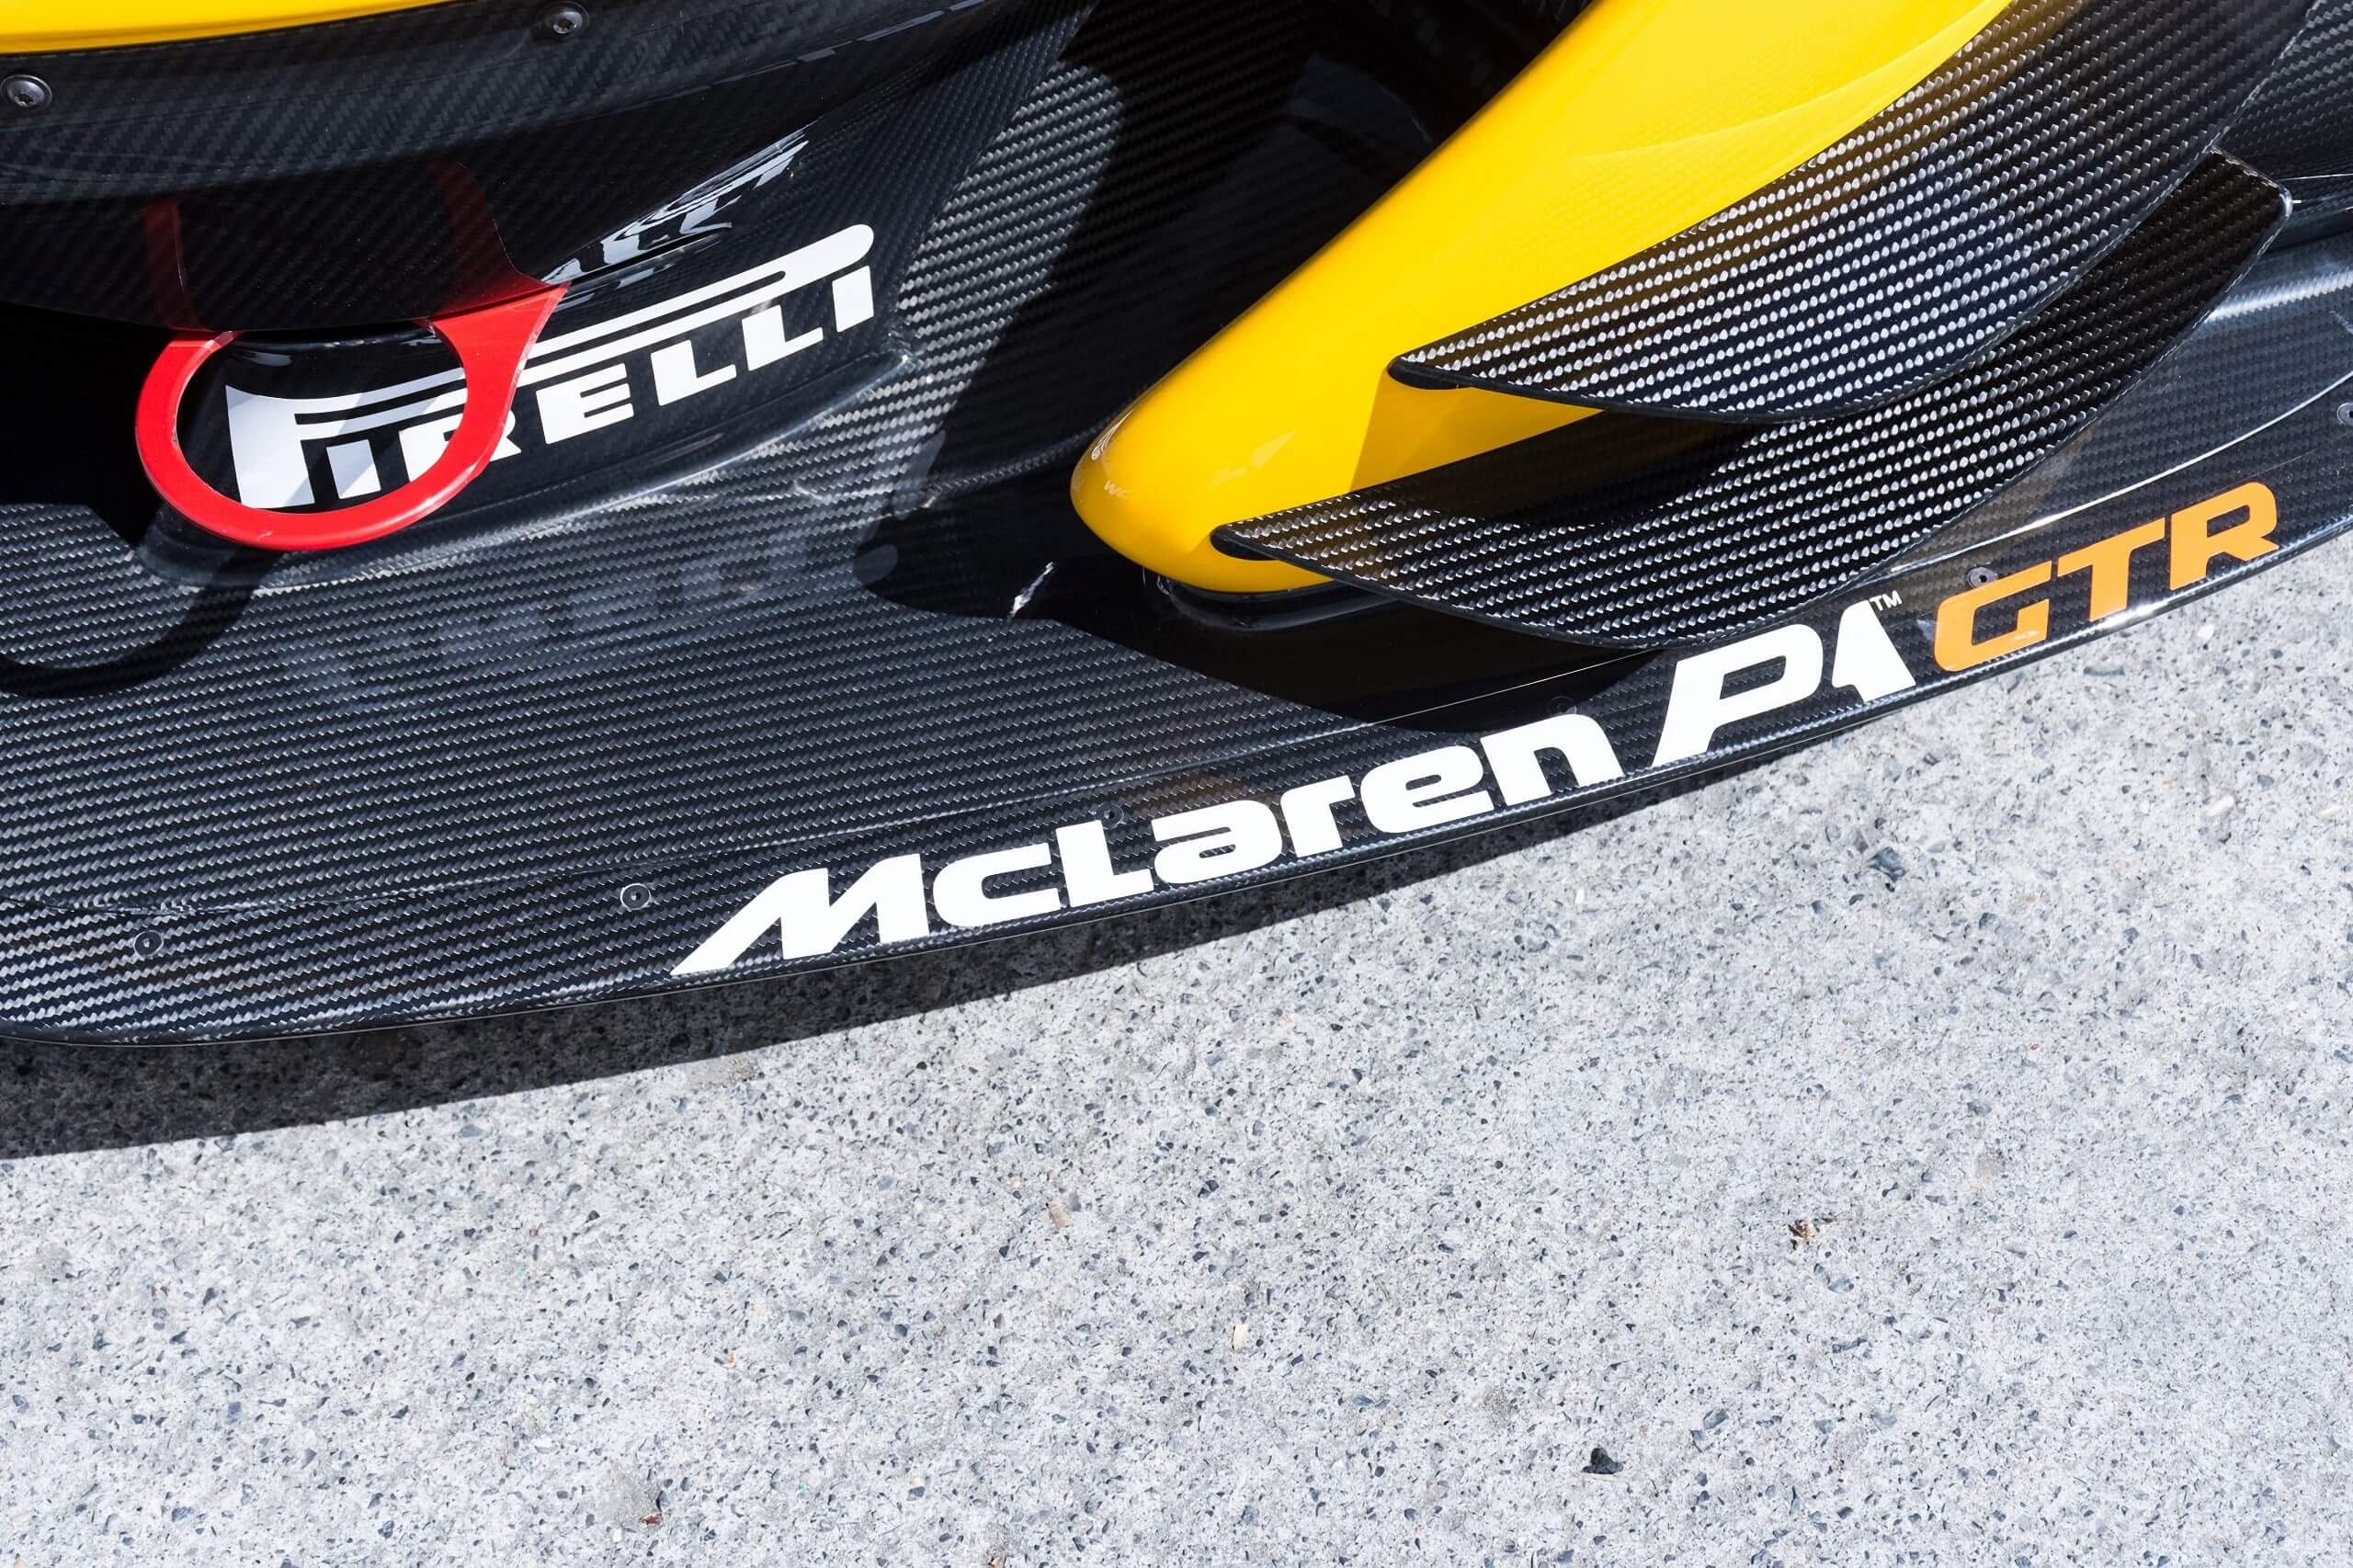 Street-legal-McLaren-P1-GTR-for-sale-34